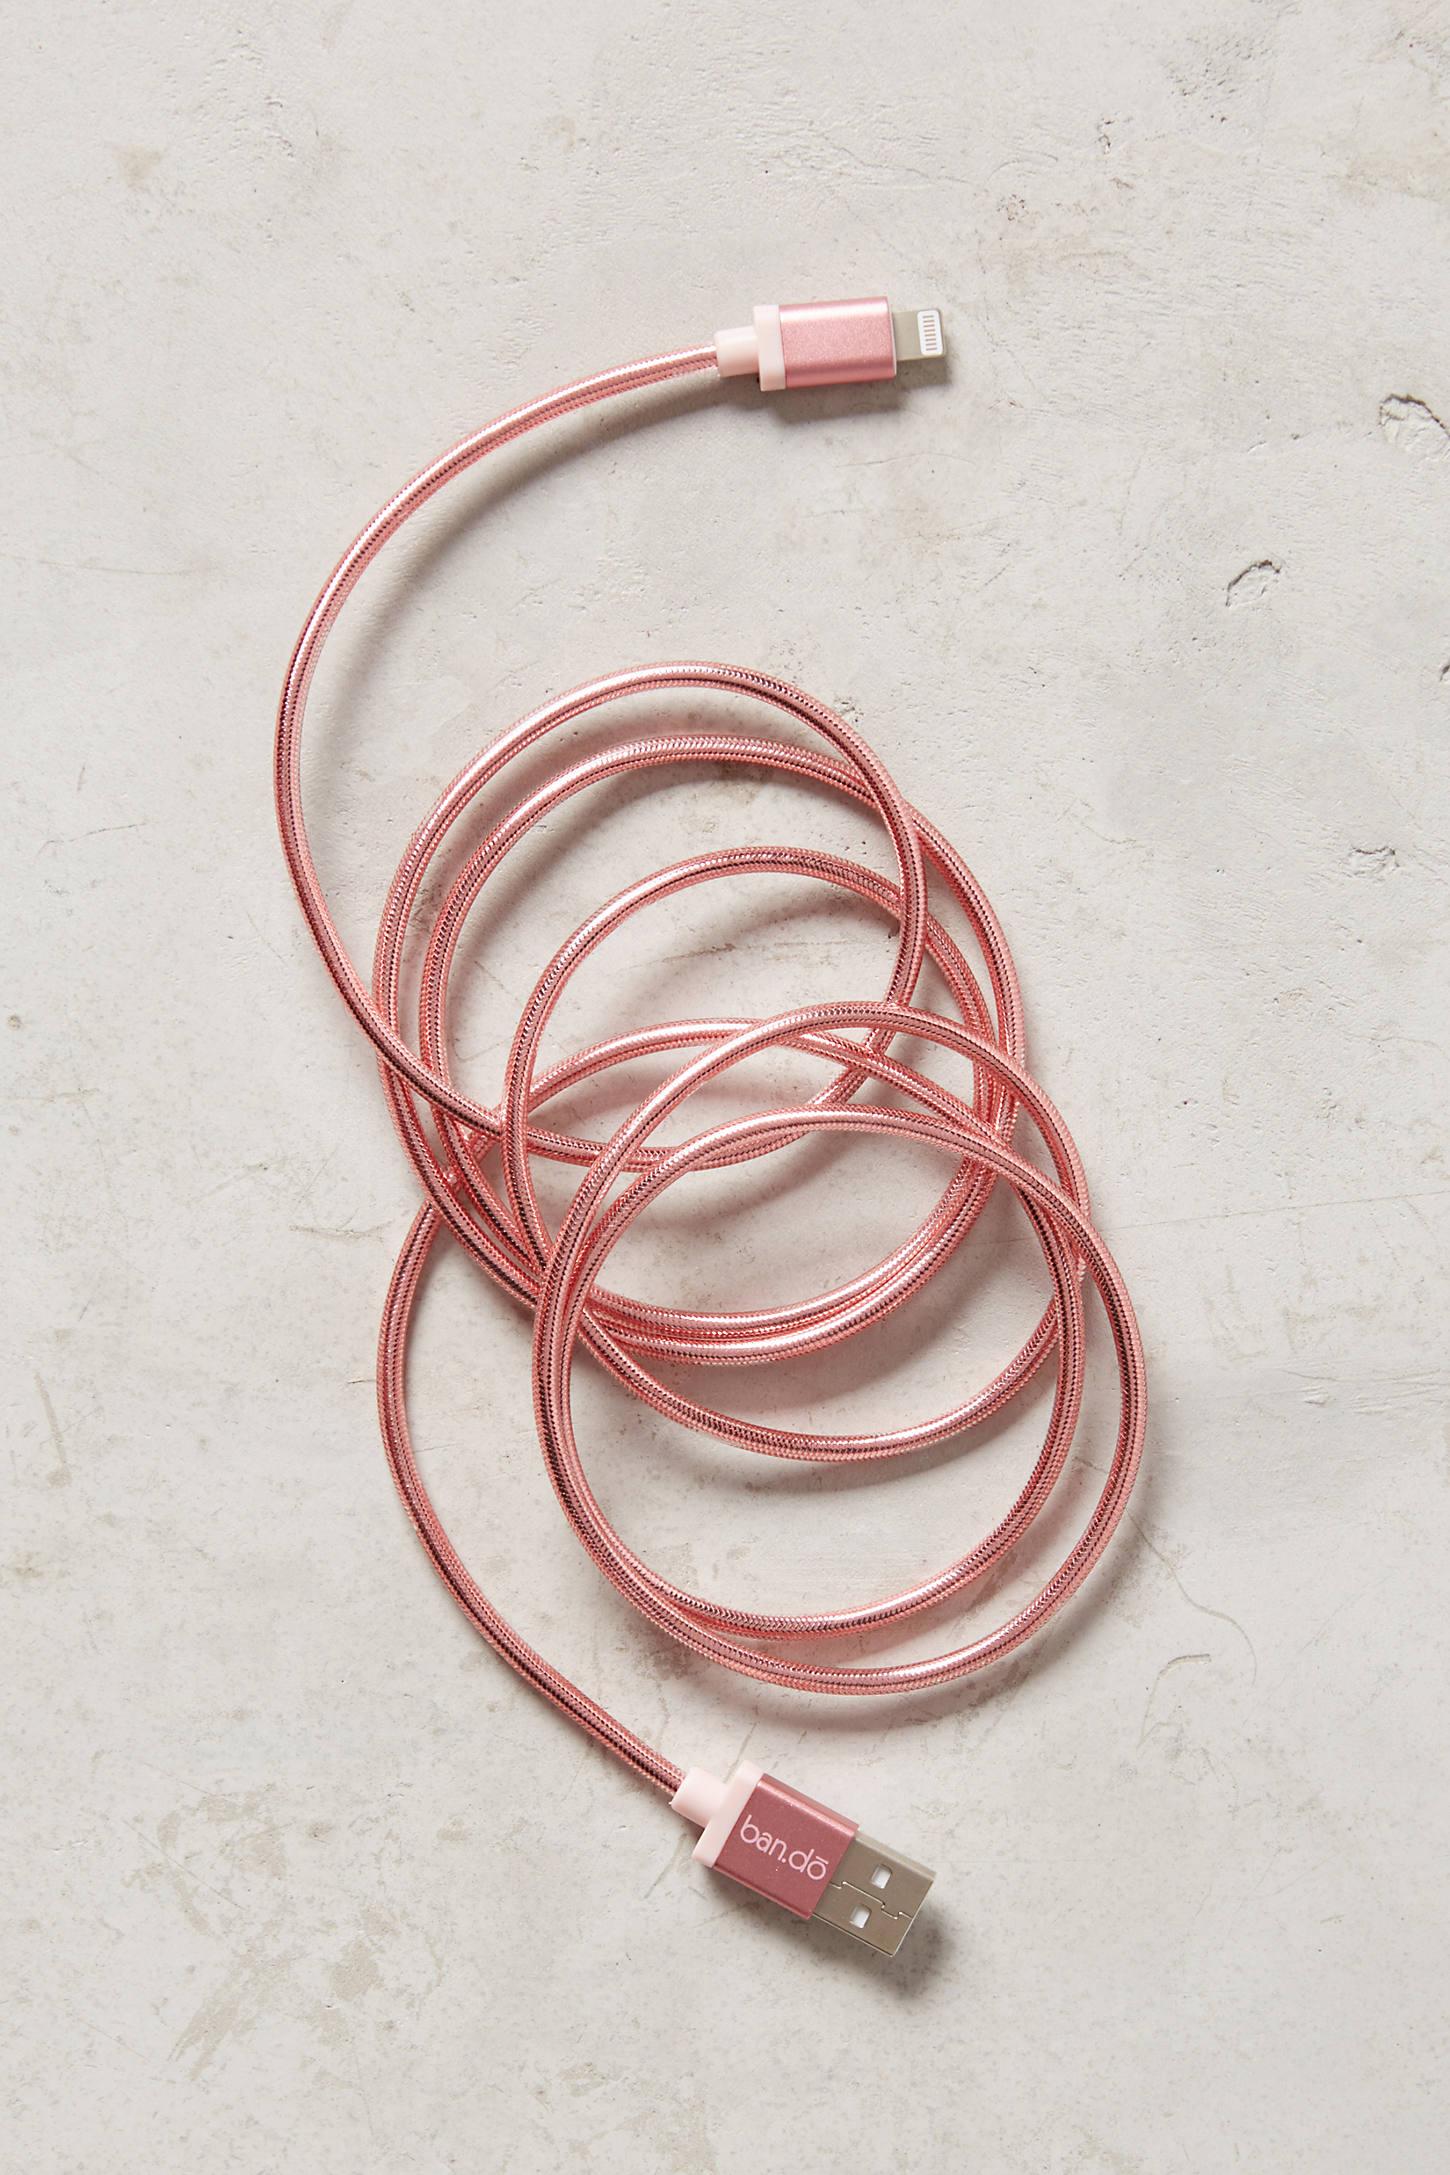 ban. do Lightning iPhone Charging Cord